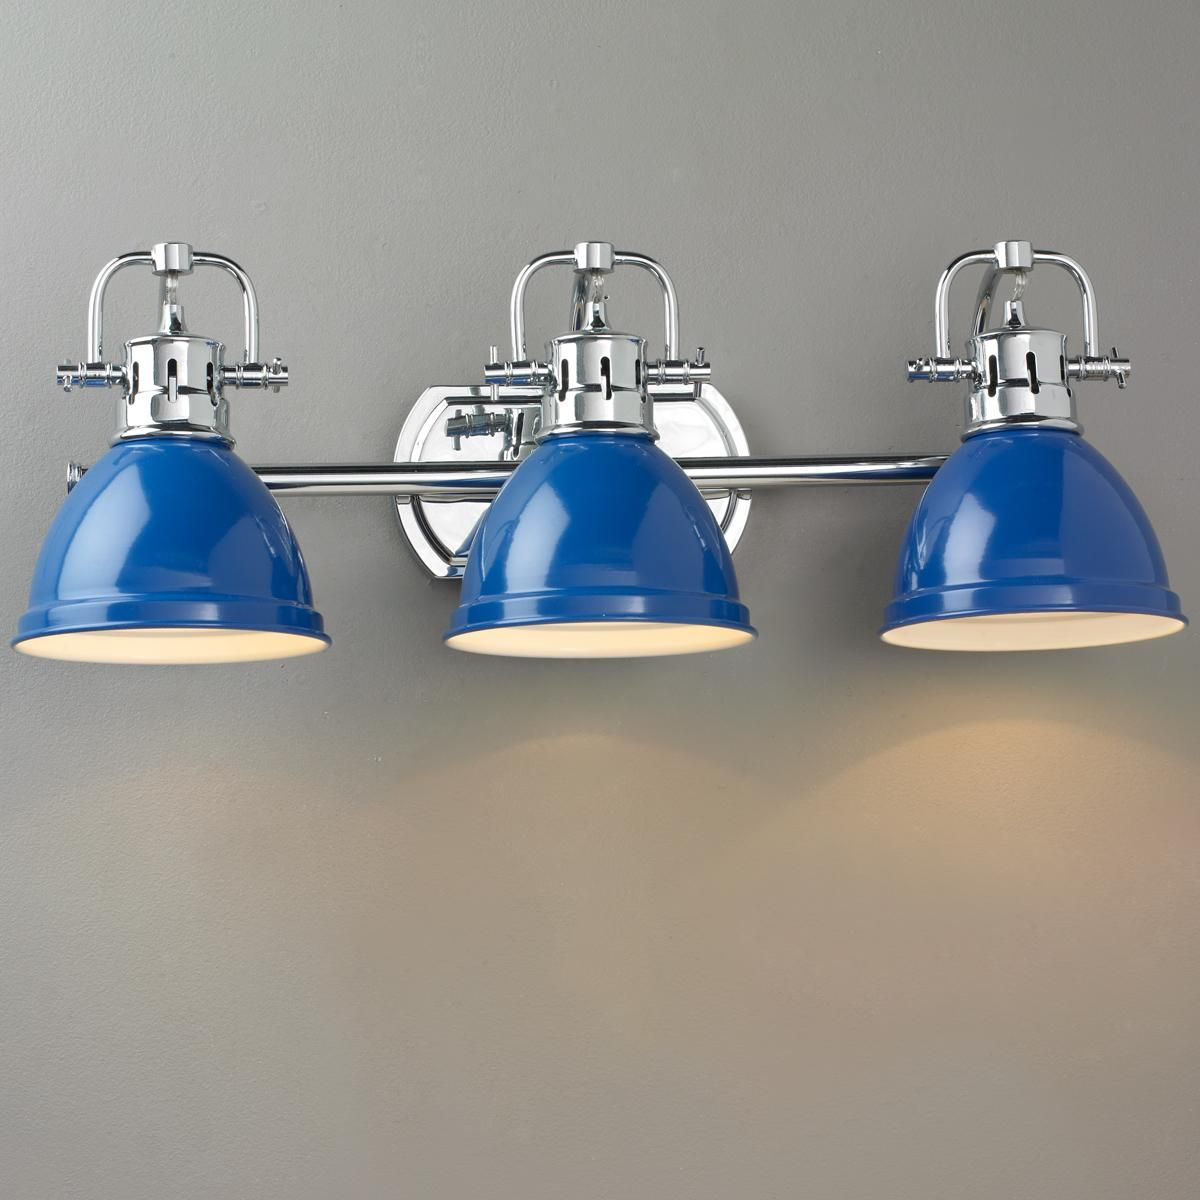 Classic Dome Shade Bath Light 3 Light Vintage Bathroom Lighting Vintage Bathroom Light Fixtures Bath Light